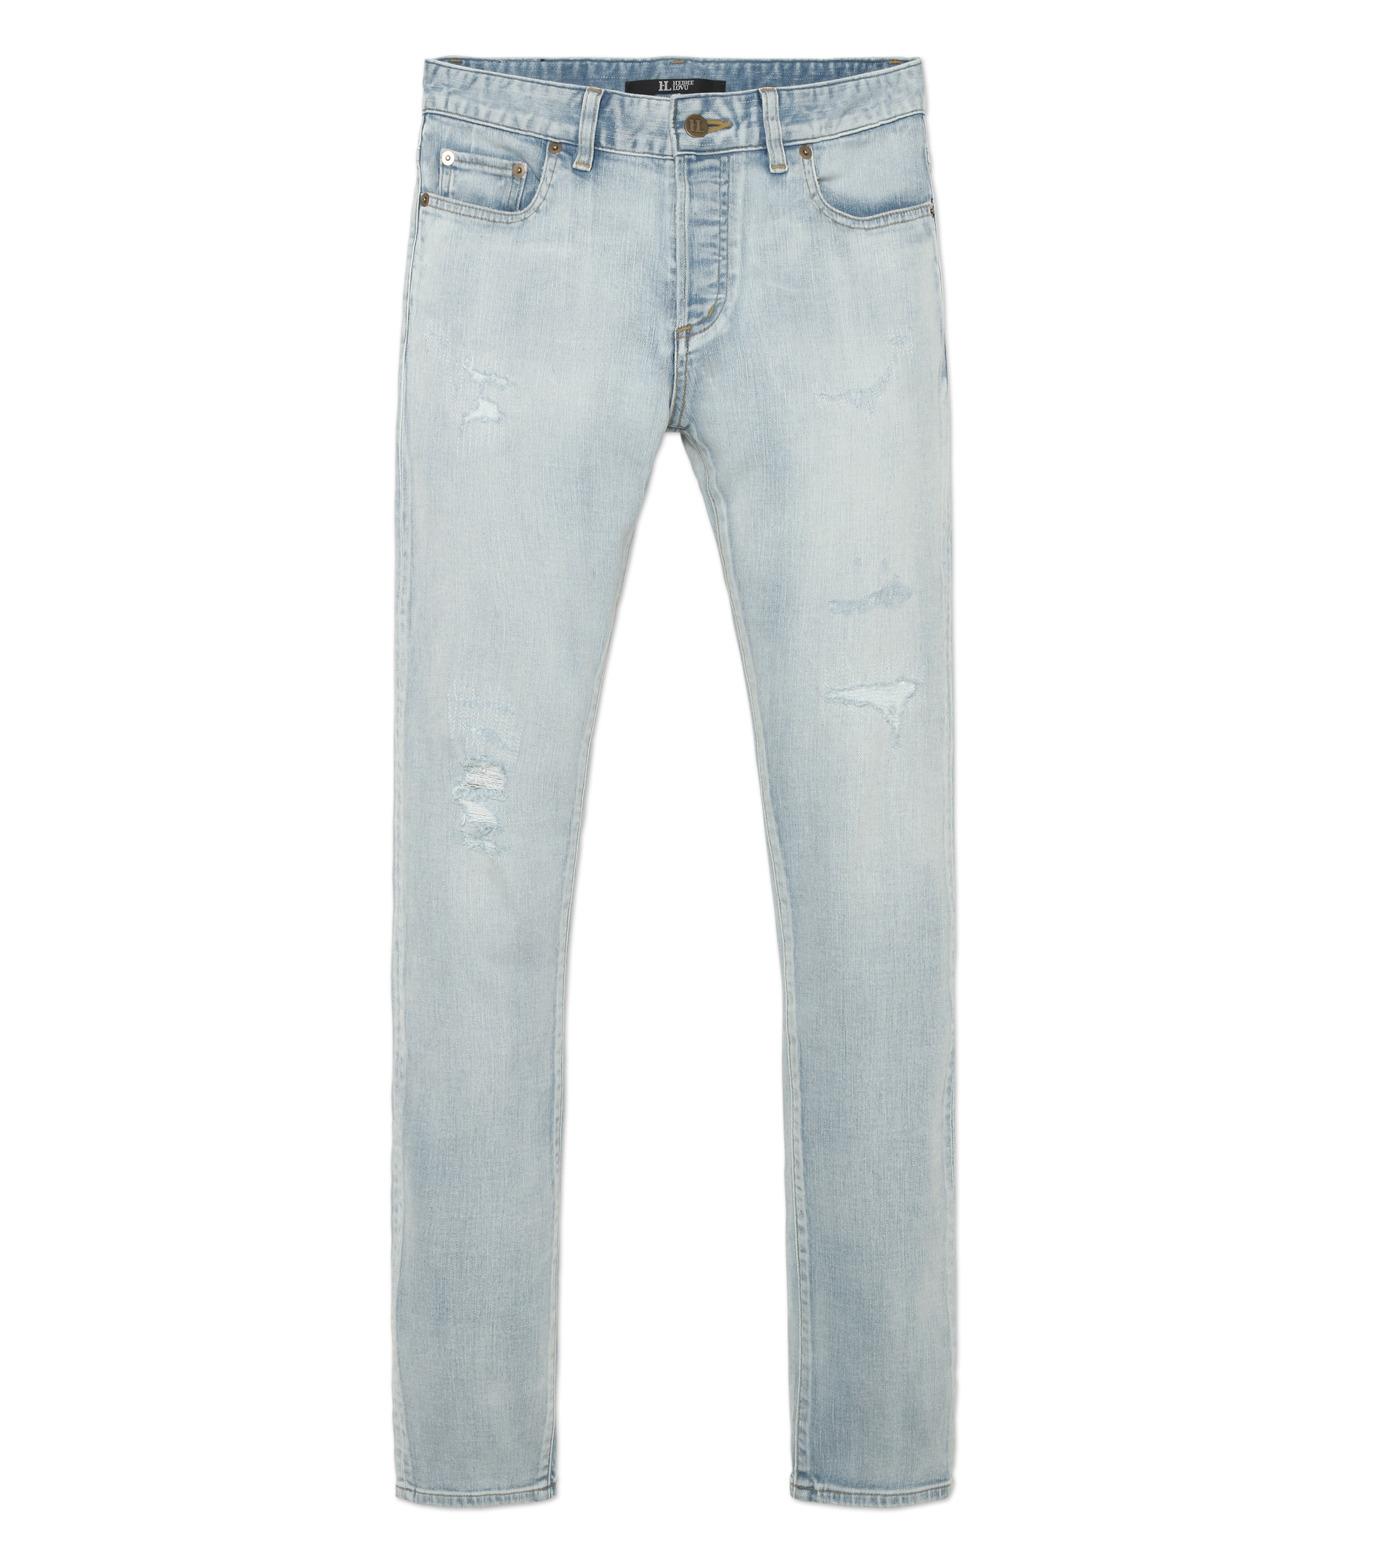 HL HEDDIE LOVU(エイチエル・エディールーヴ)のbleach skin slim-LIGHT BLUE(パンツ/pants)-18S98001-91 拡大詳細画像4